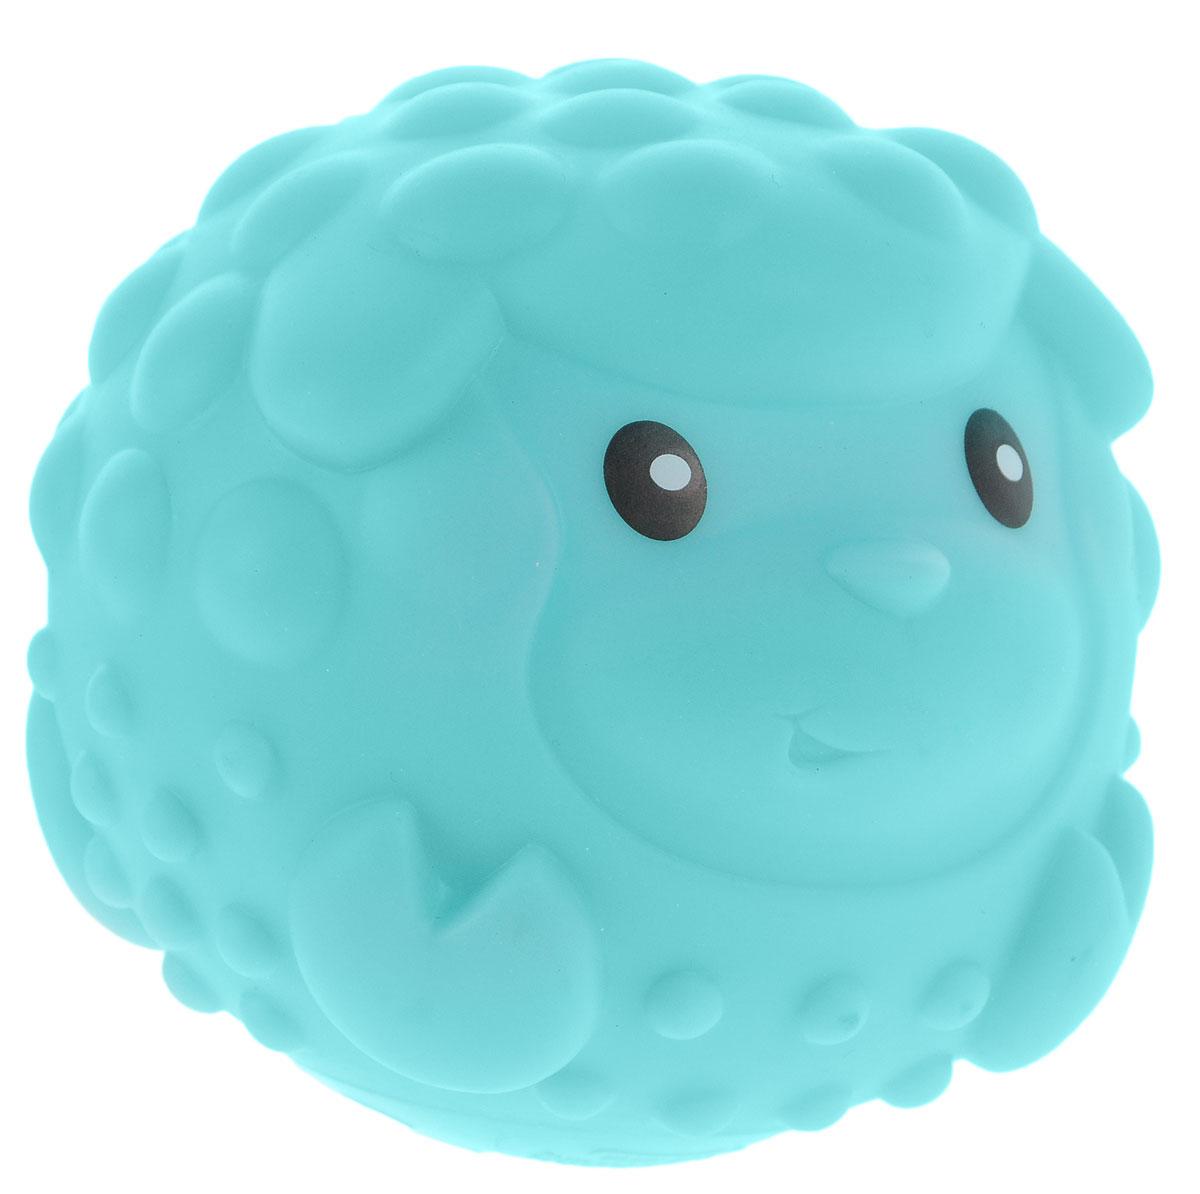 B kids Развивающая игрушка-пищалка Овечка развивающая игрушка djeco зверюшки попрыгунчики пастель 06105